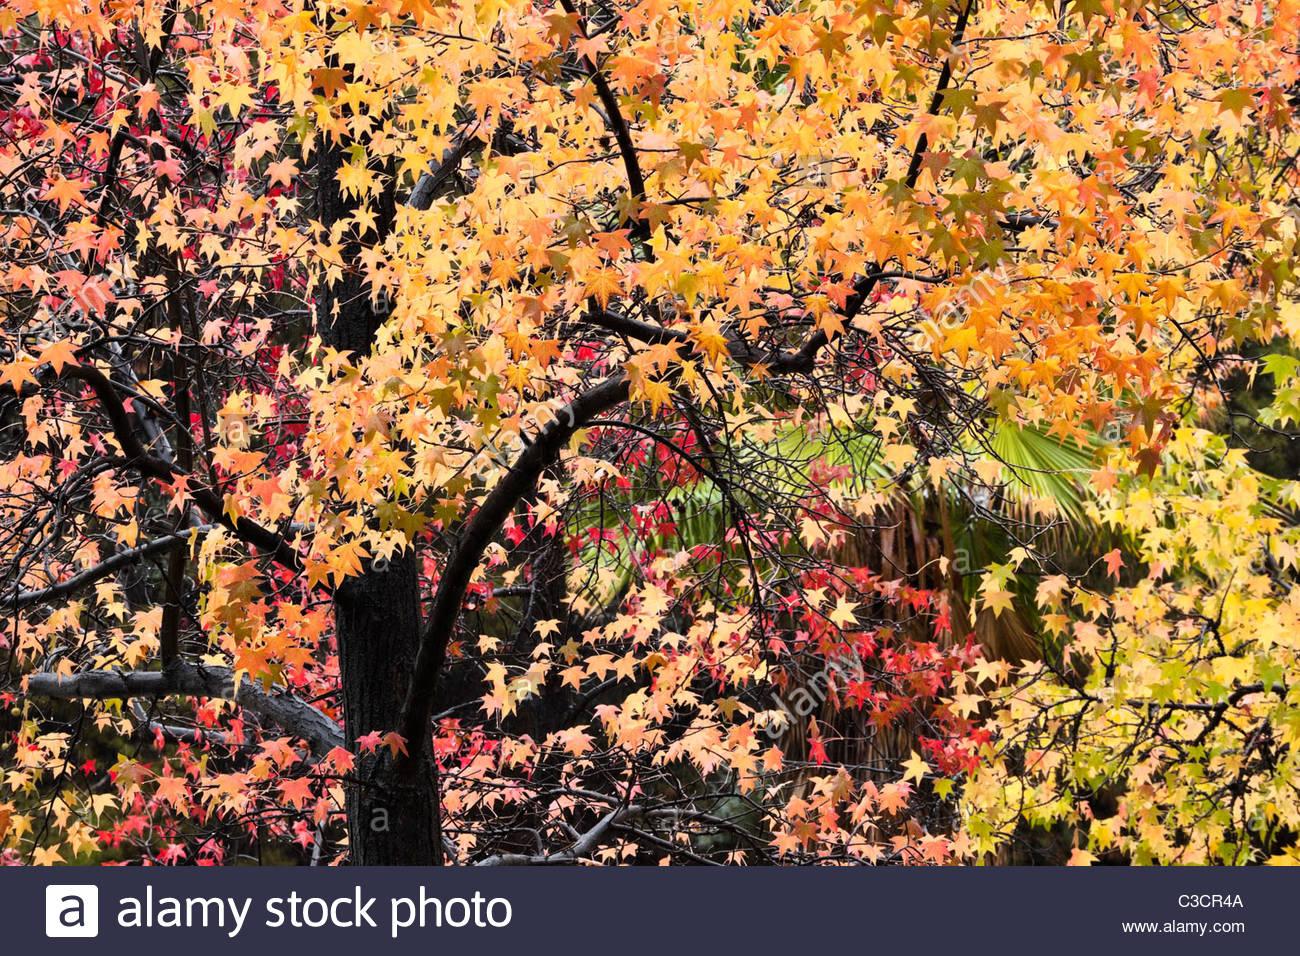 Fall Foliage, Angeles National Forest / Glendora, California - Stock Image